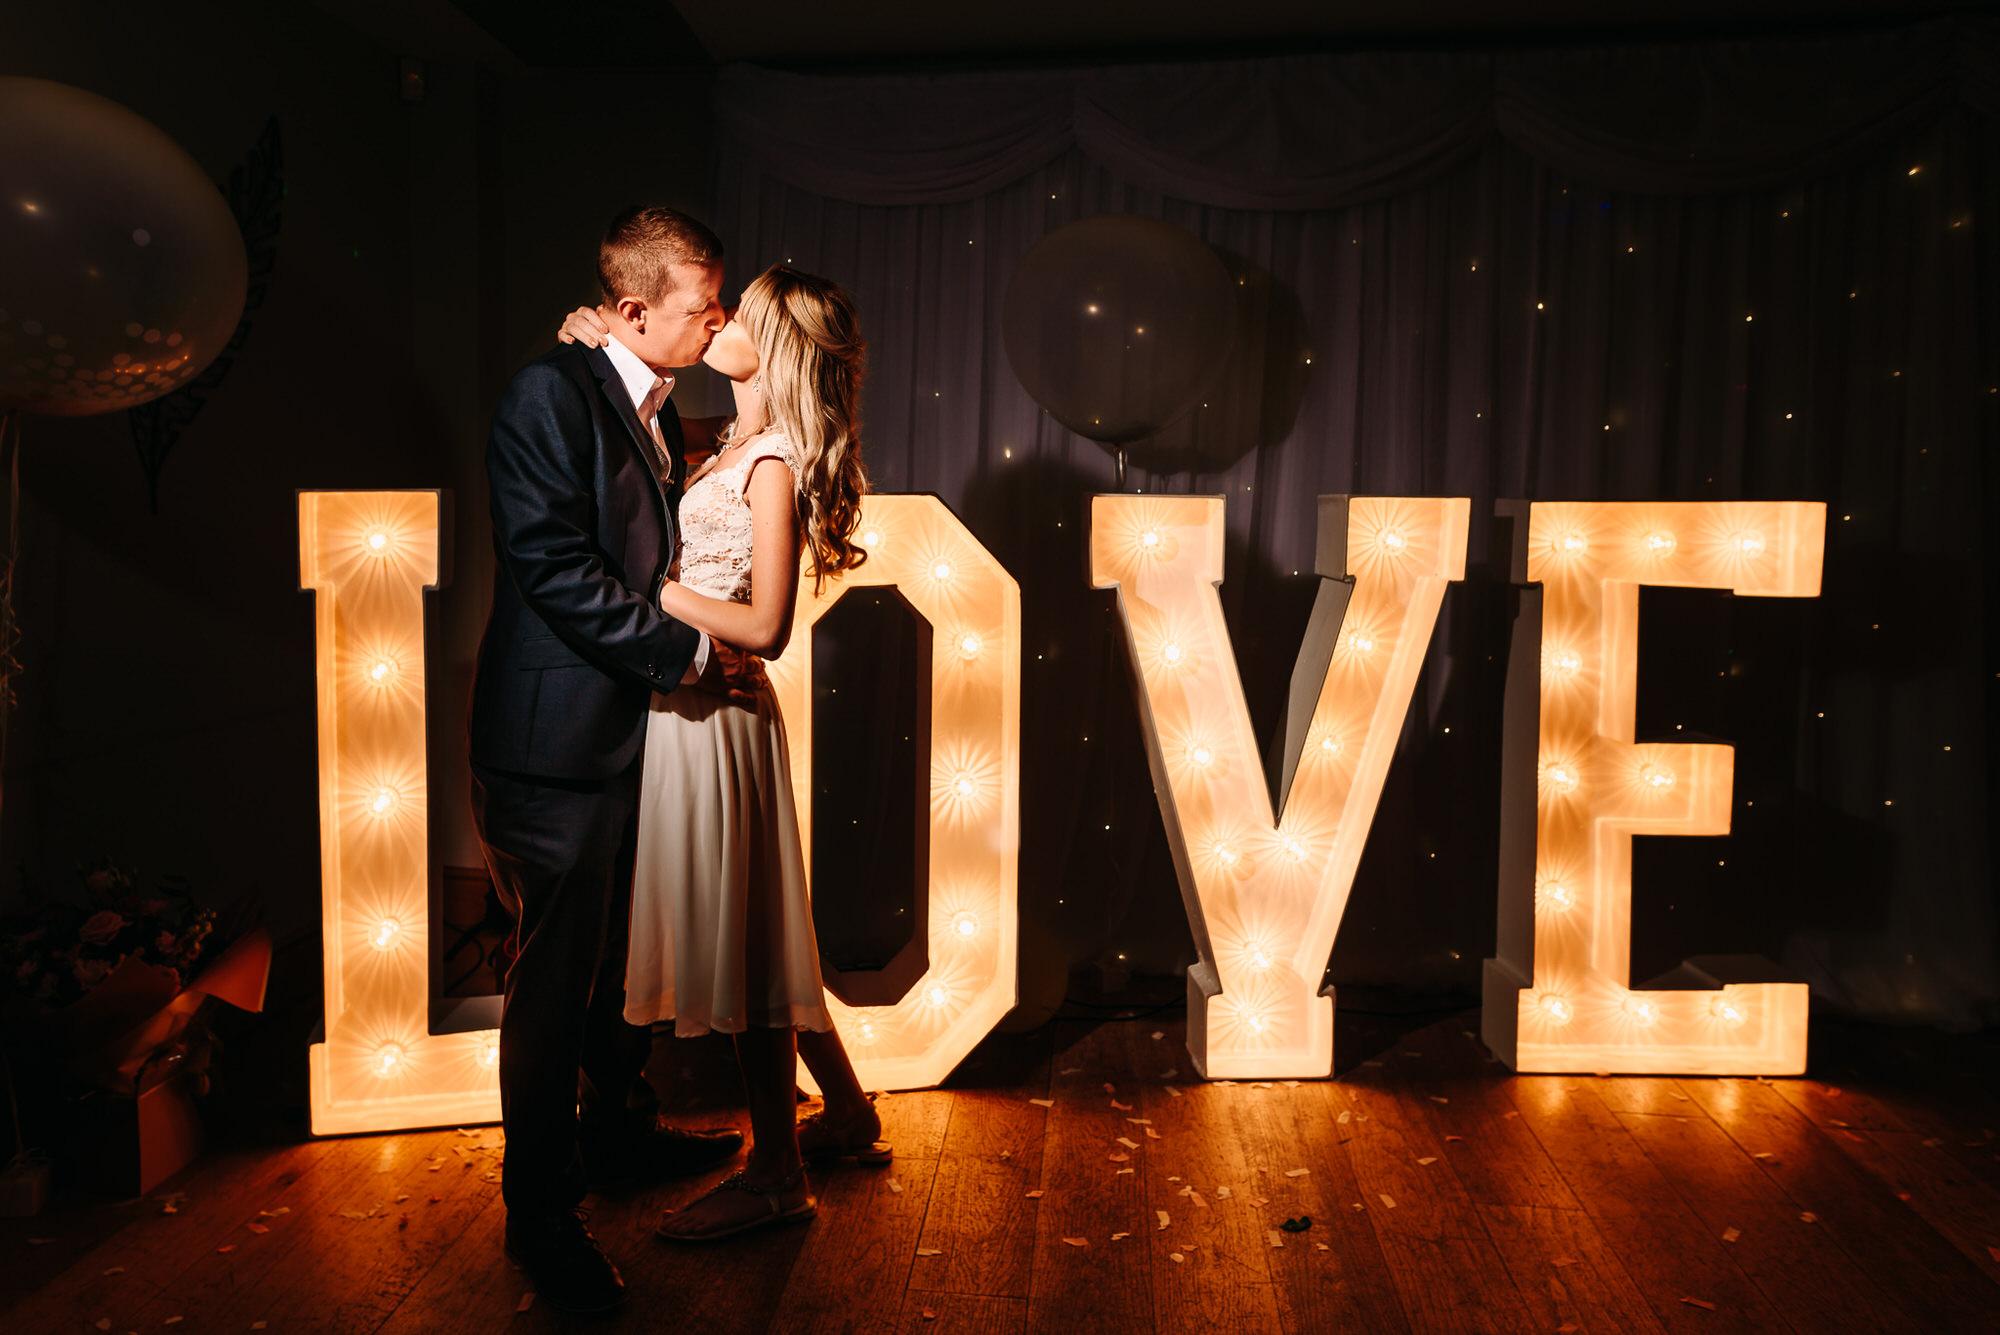 Best Of Yorkshire Wedding Photography 2017 - Martyn Hand-38.jpg